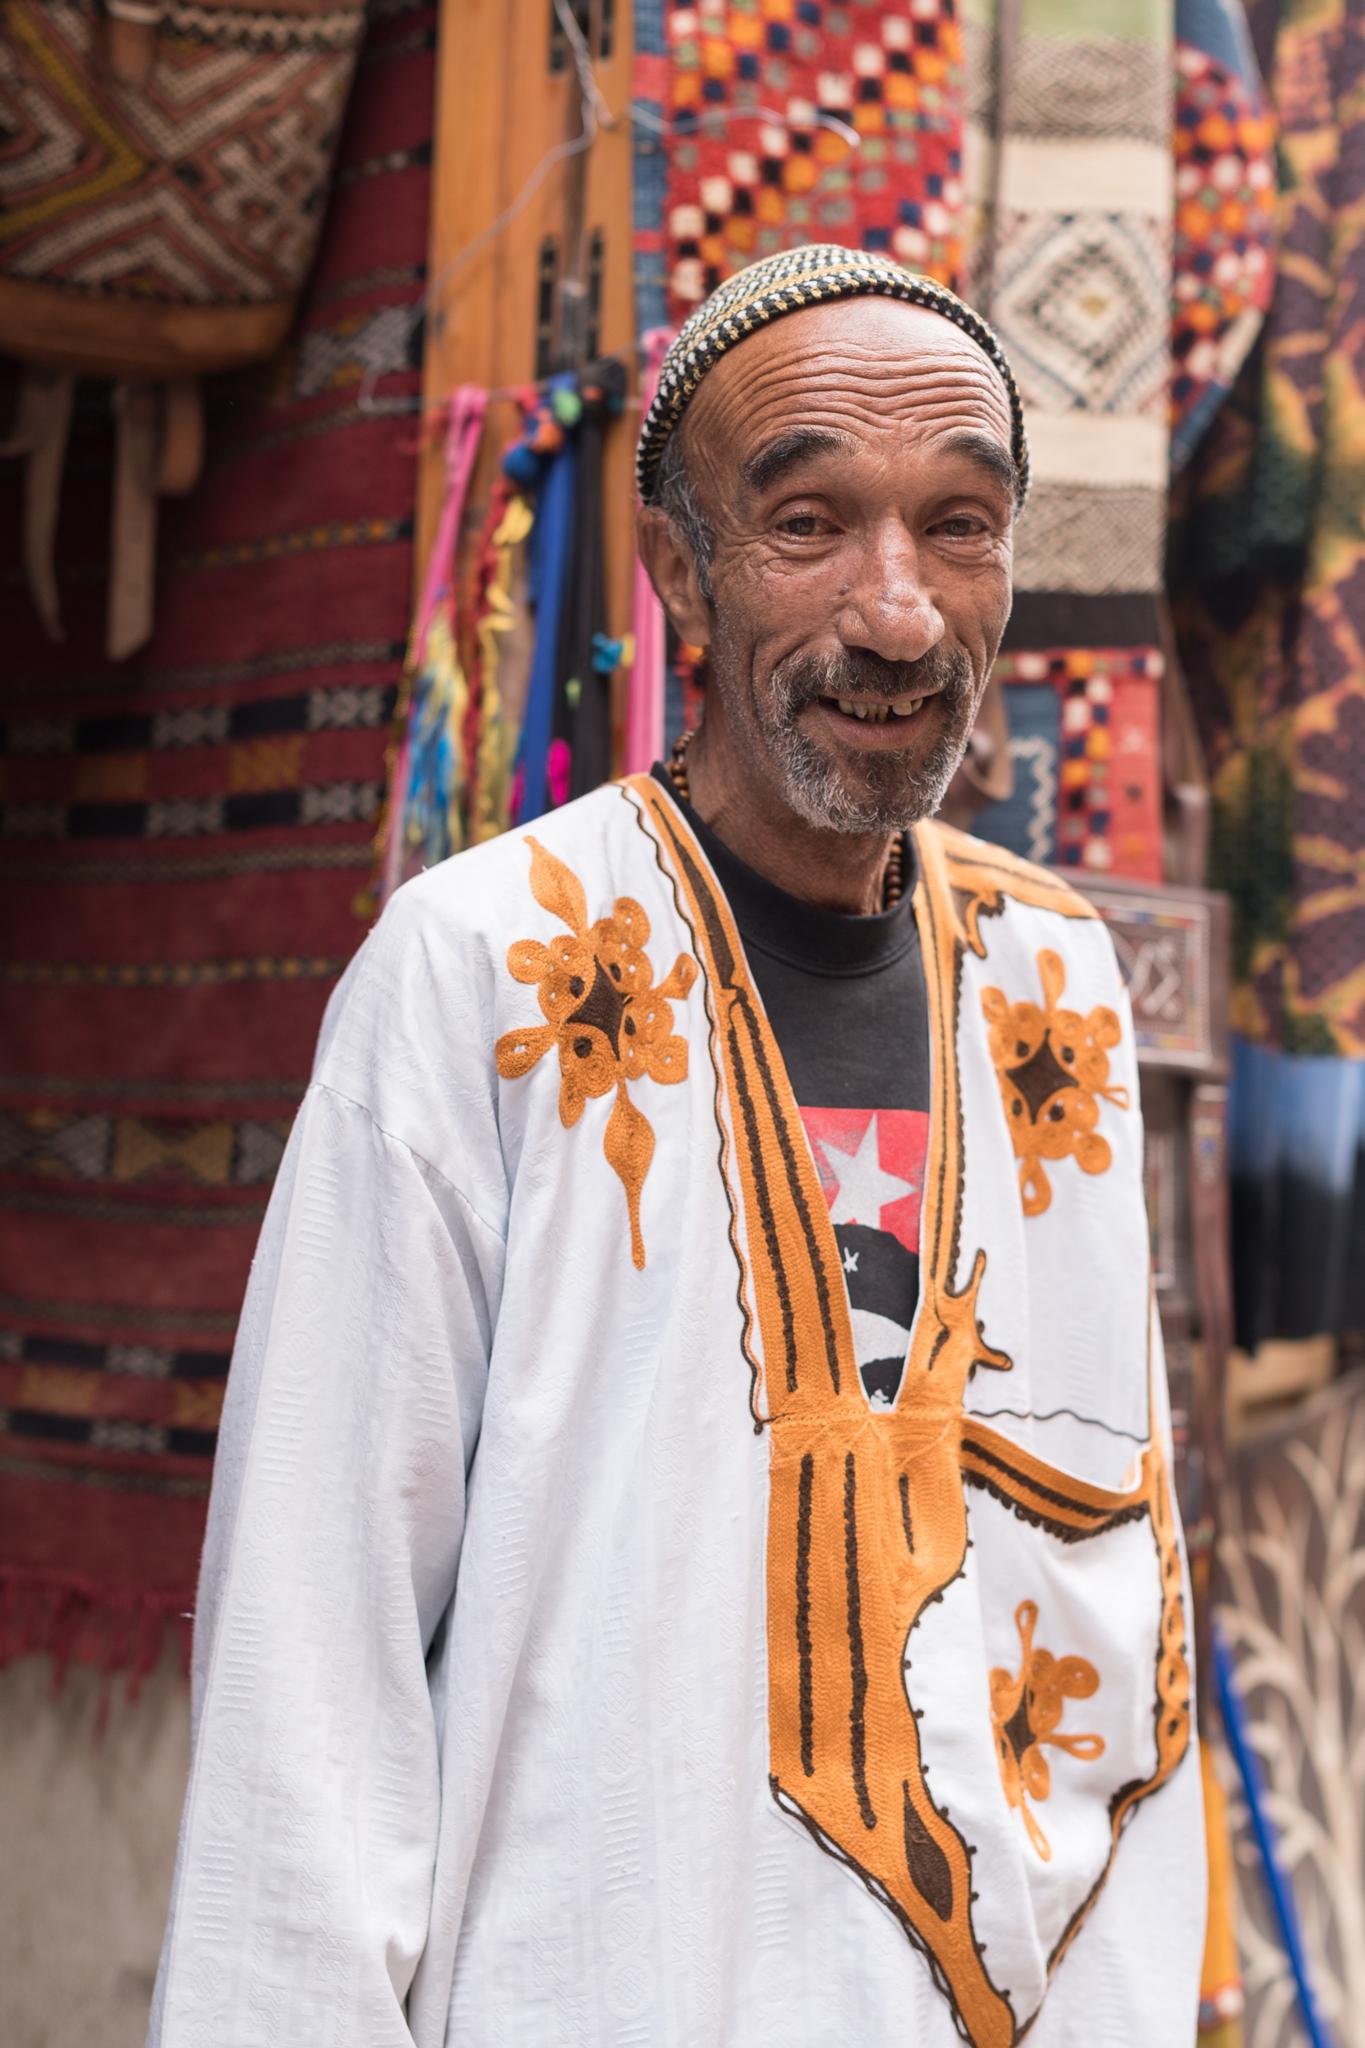 Morocco_Brenna Duncan-06084.jpg